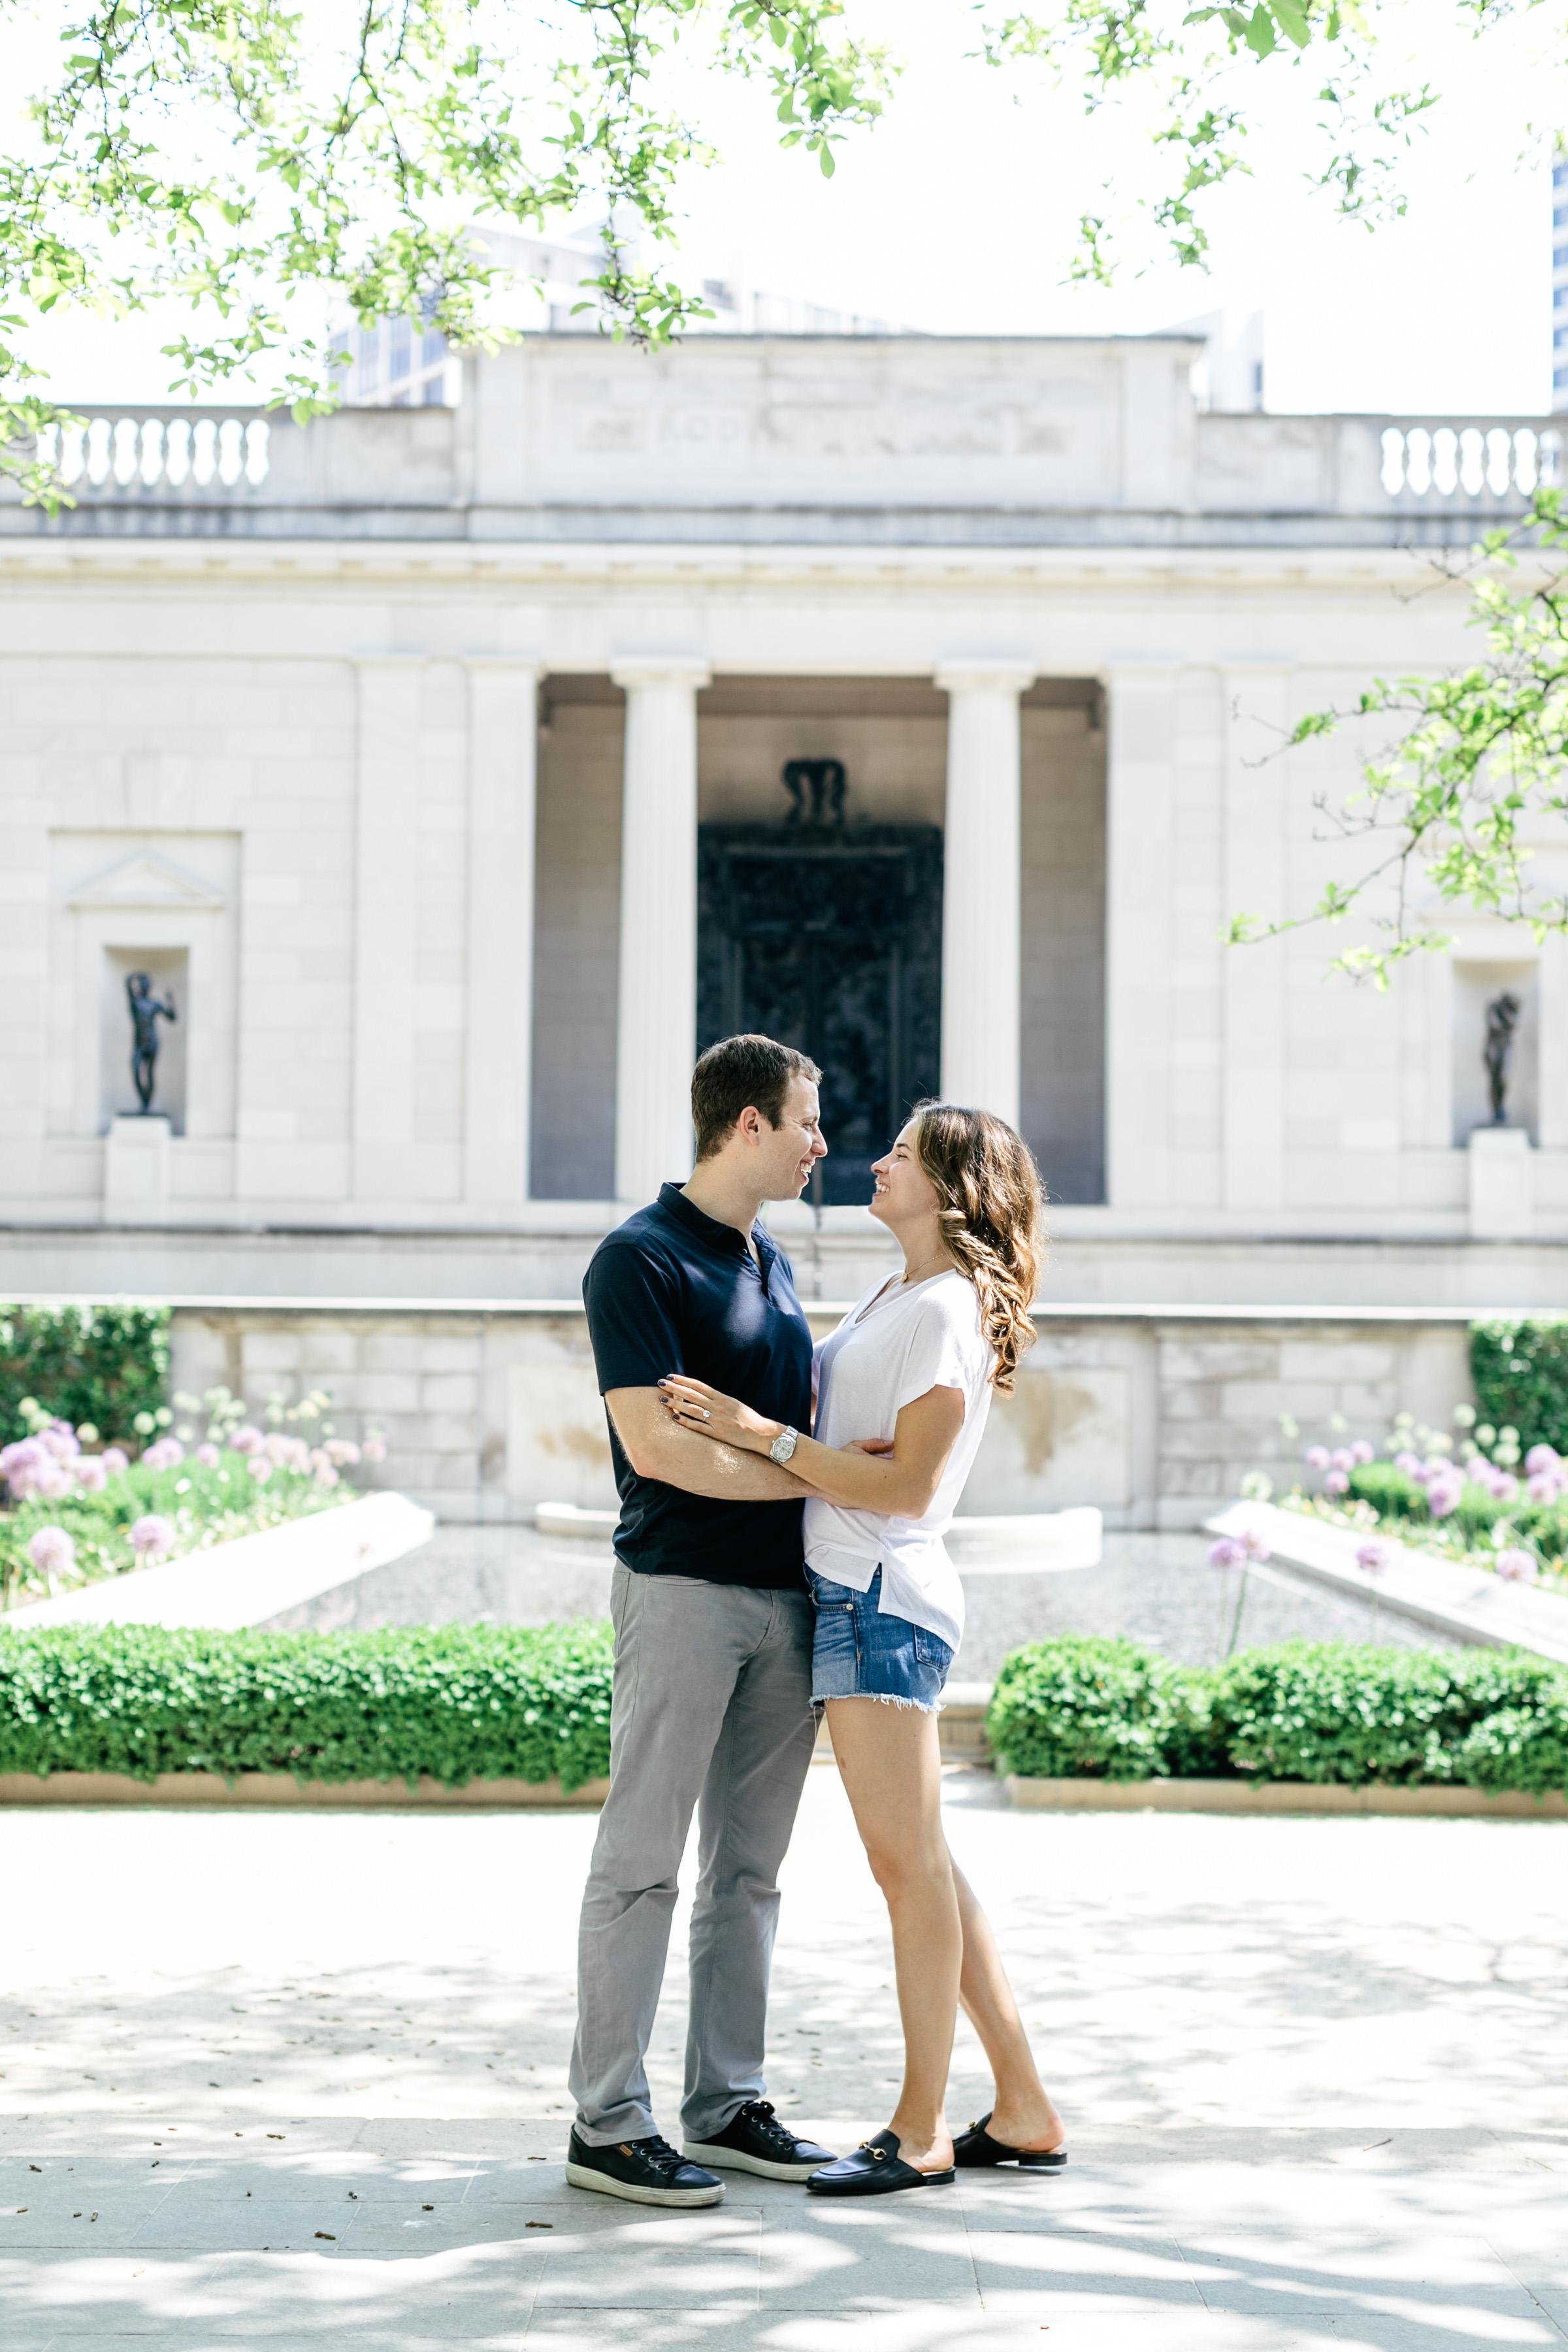 photography-natural-candid-engaged-proposal-philadelphia-wedding-rodin museum-barnes foundation-parkway-modern-lifestyle-19.JPG